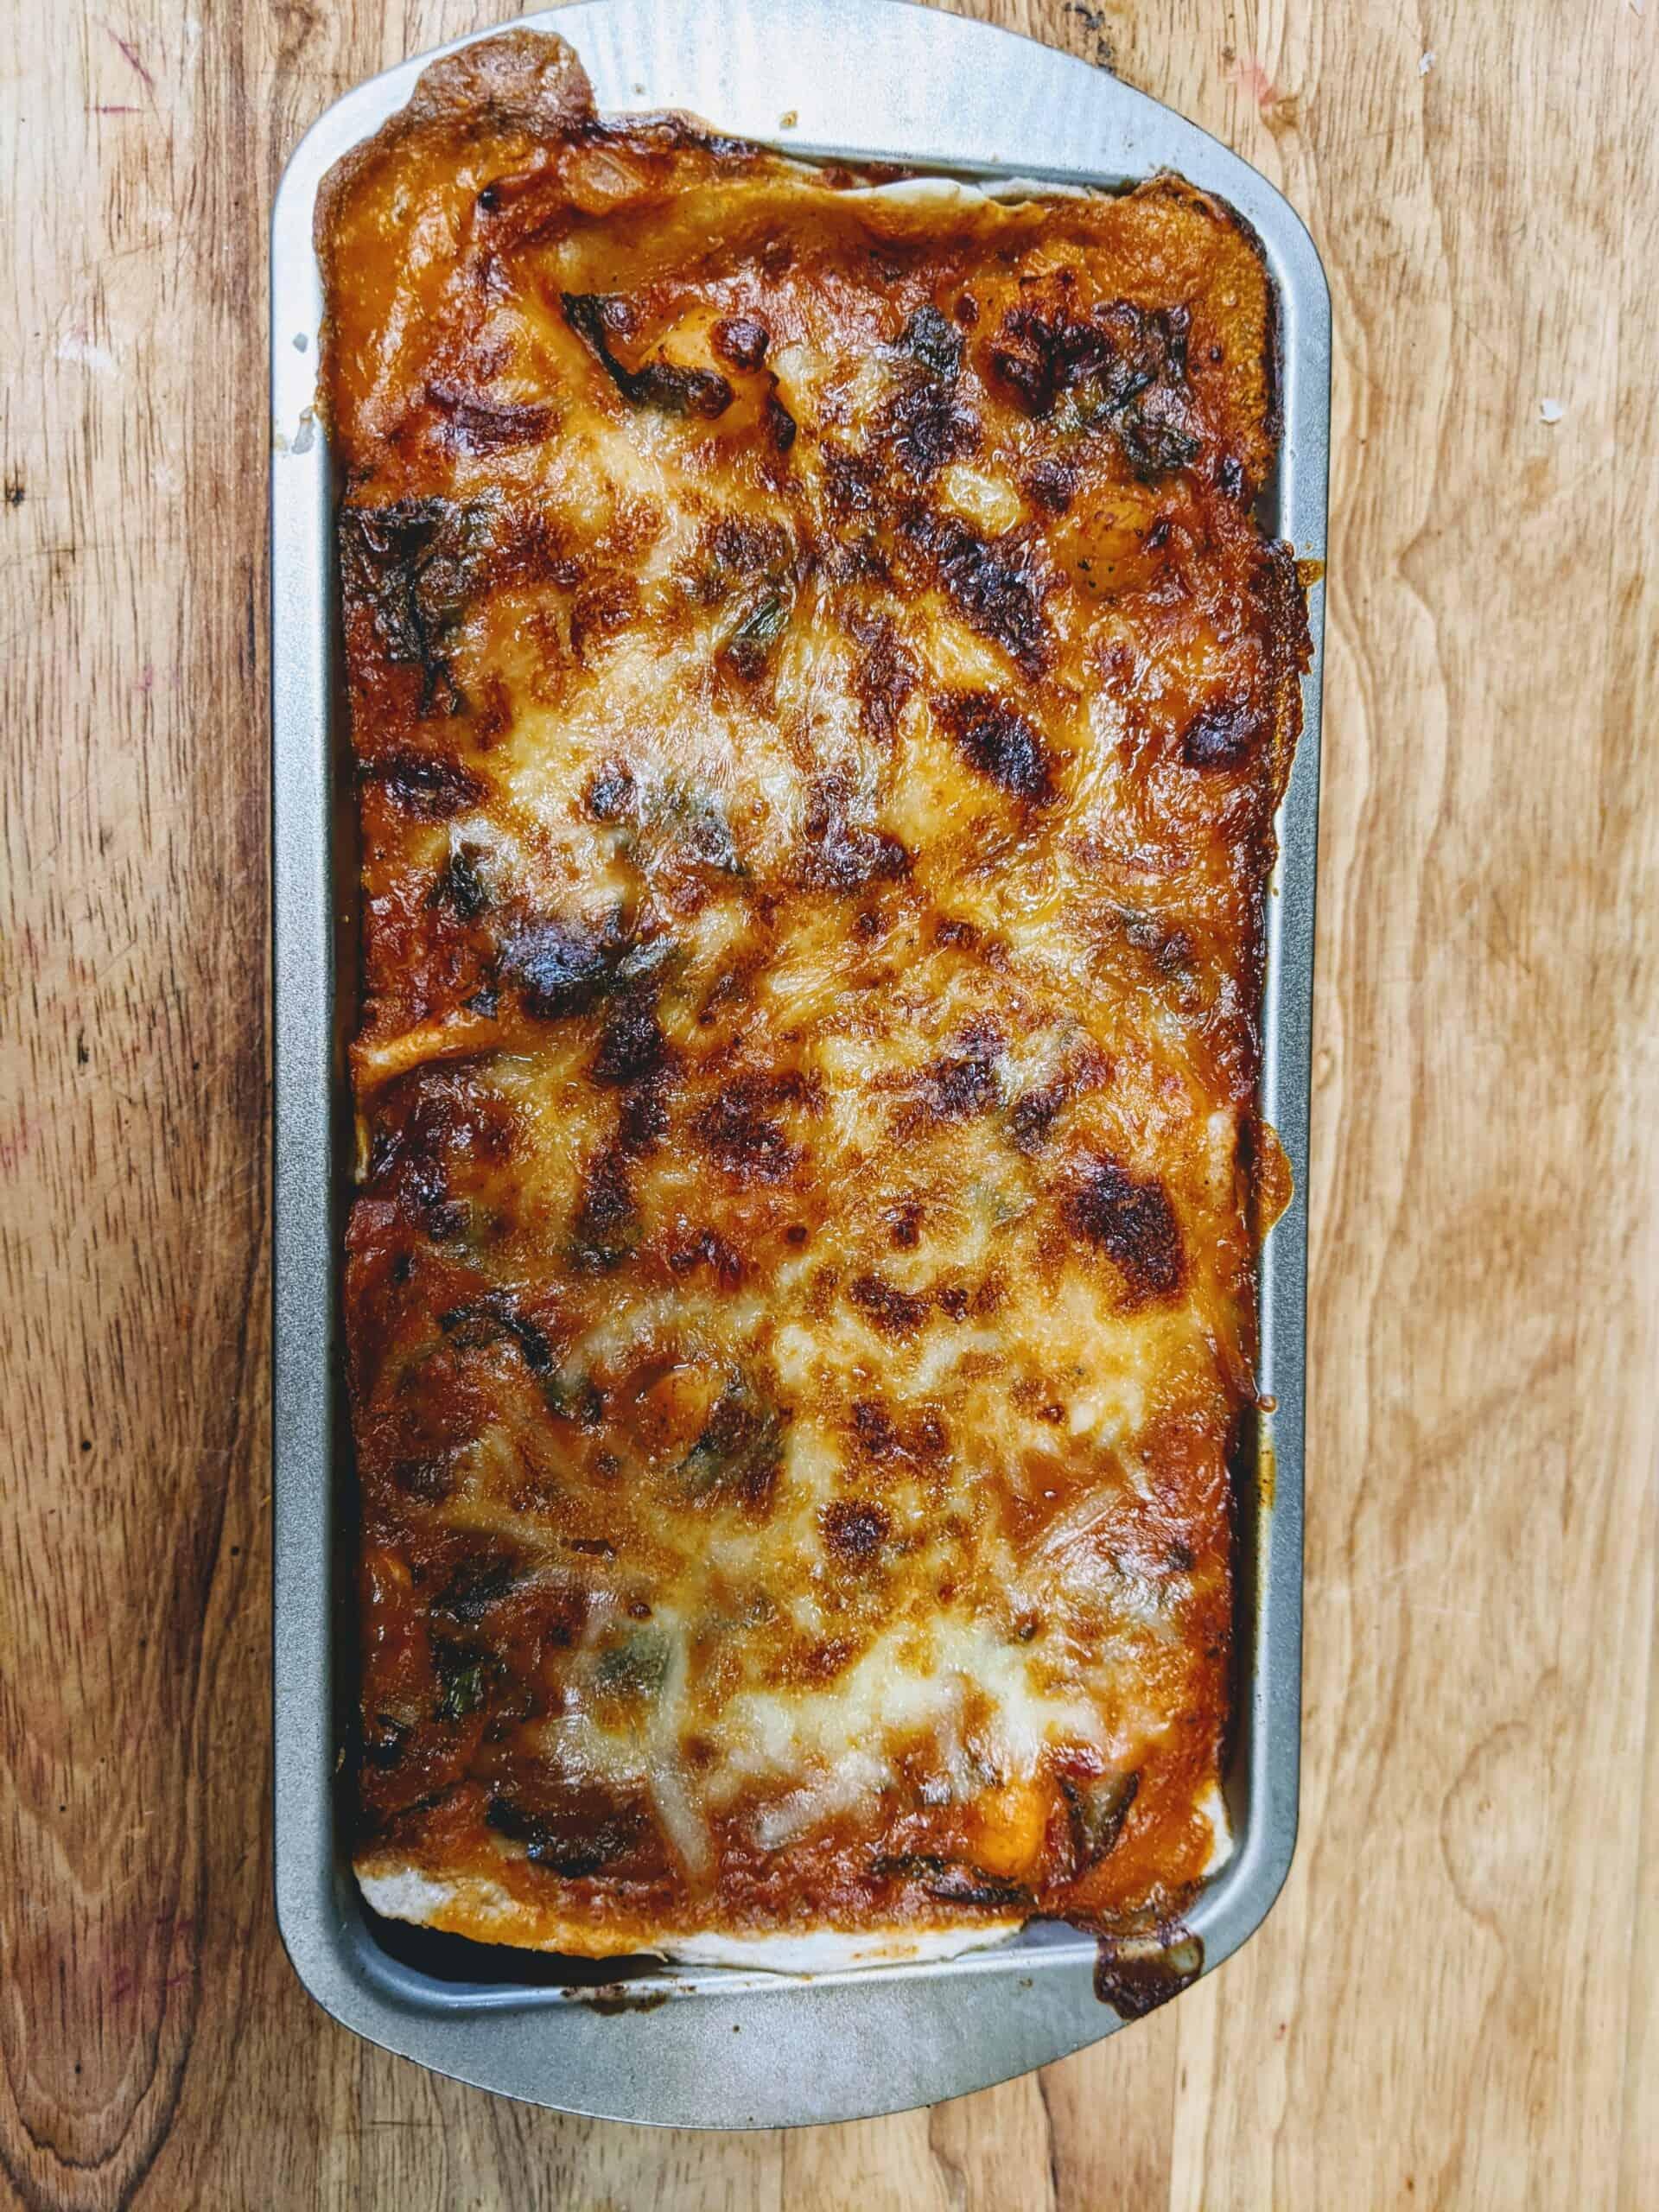 Baked Seafood lasagna in Pan